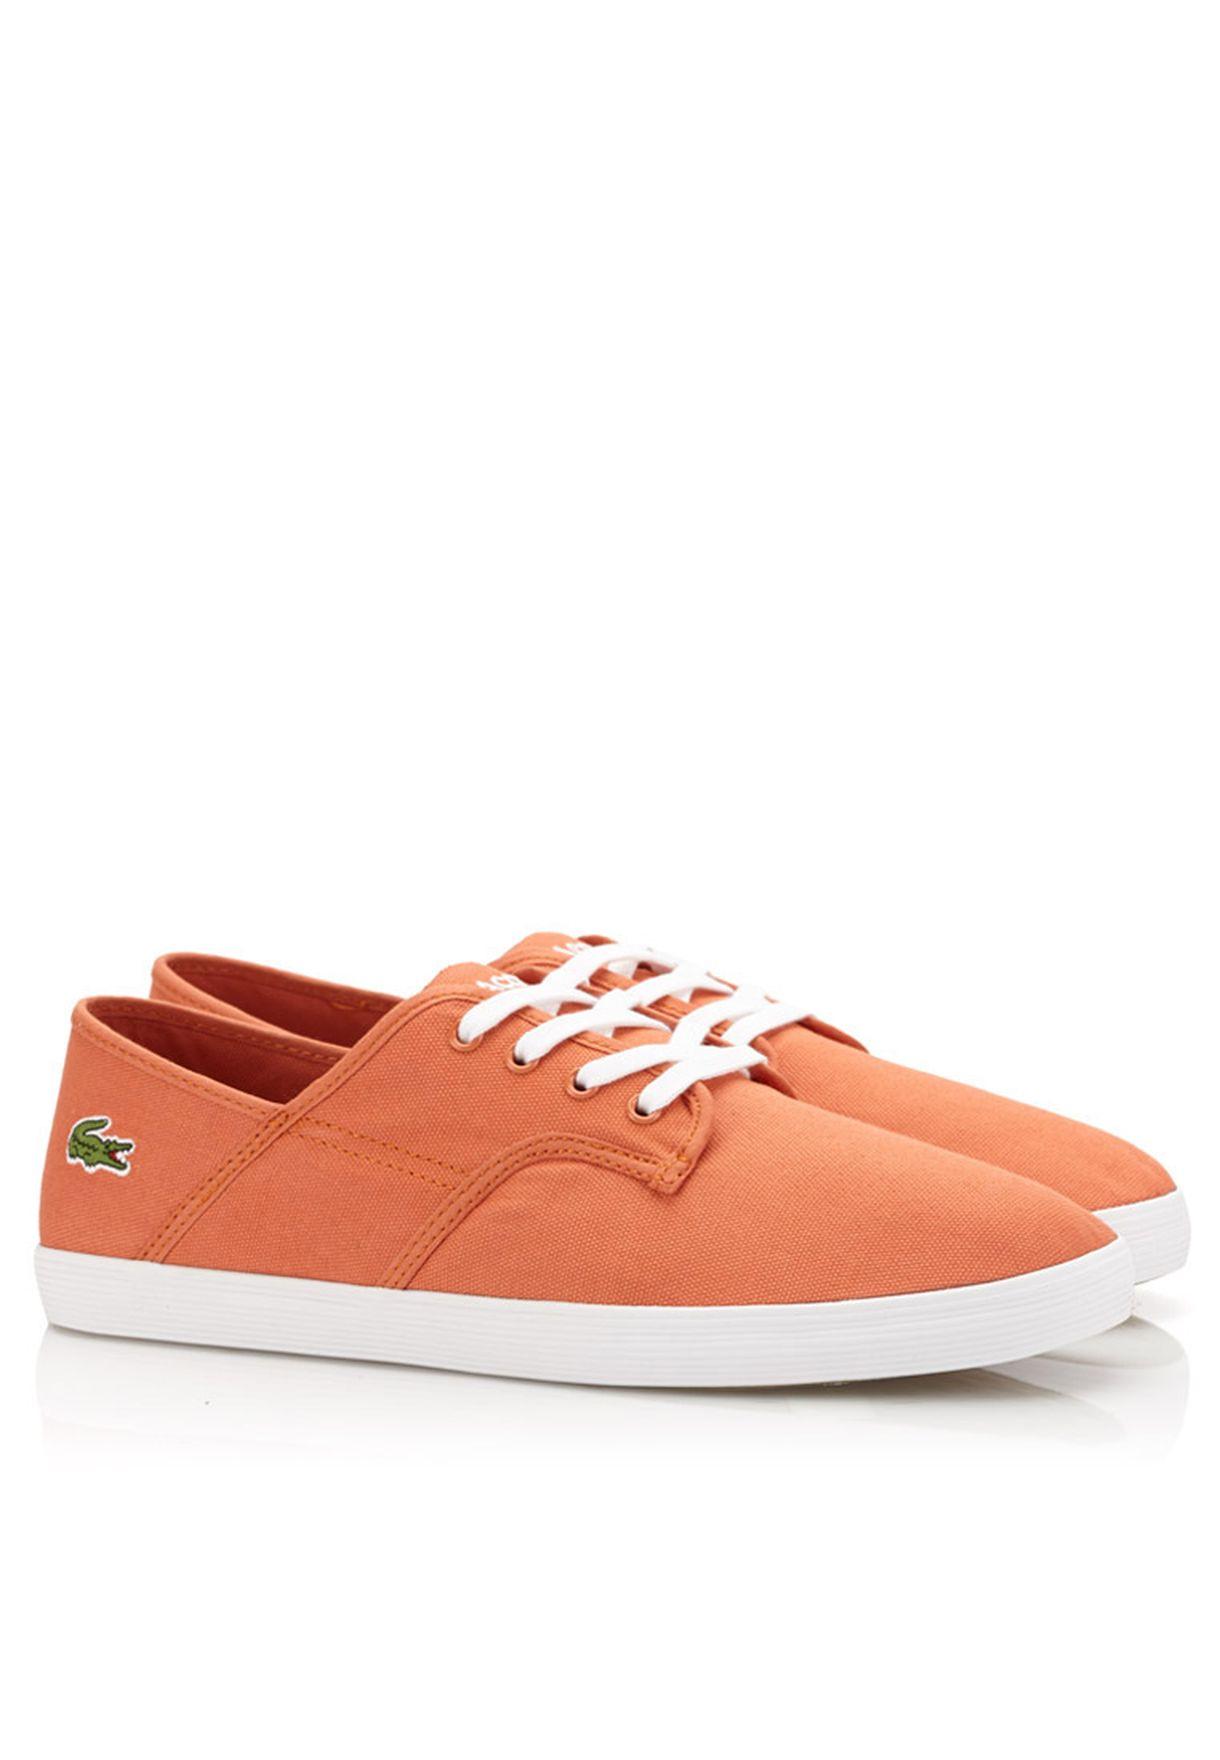 460c8fb5b Shop Lacoste orange Andover Eos Sneakers 28SPM0111-DA6 for Men in ...